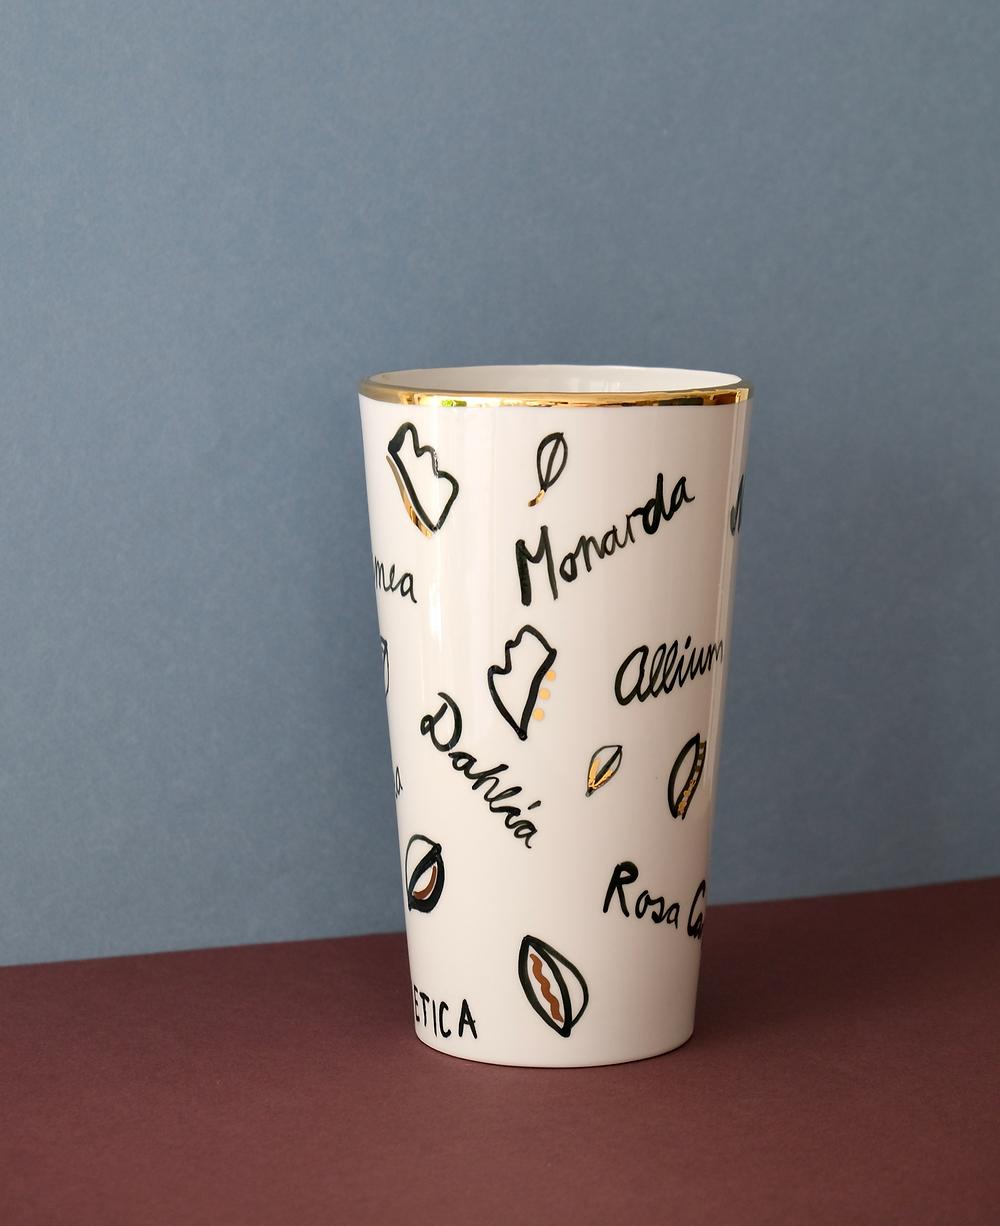 Vase Blumenpost Yael Anders Limited Edition Limitiert Gold Keramik Keramikvase Porzellan Saisonkalender